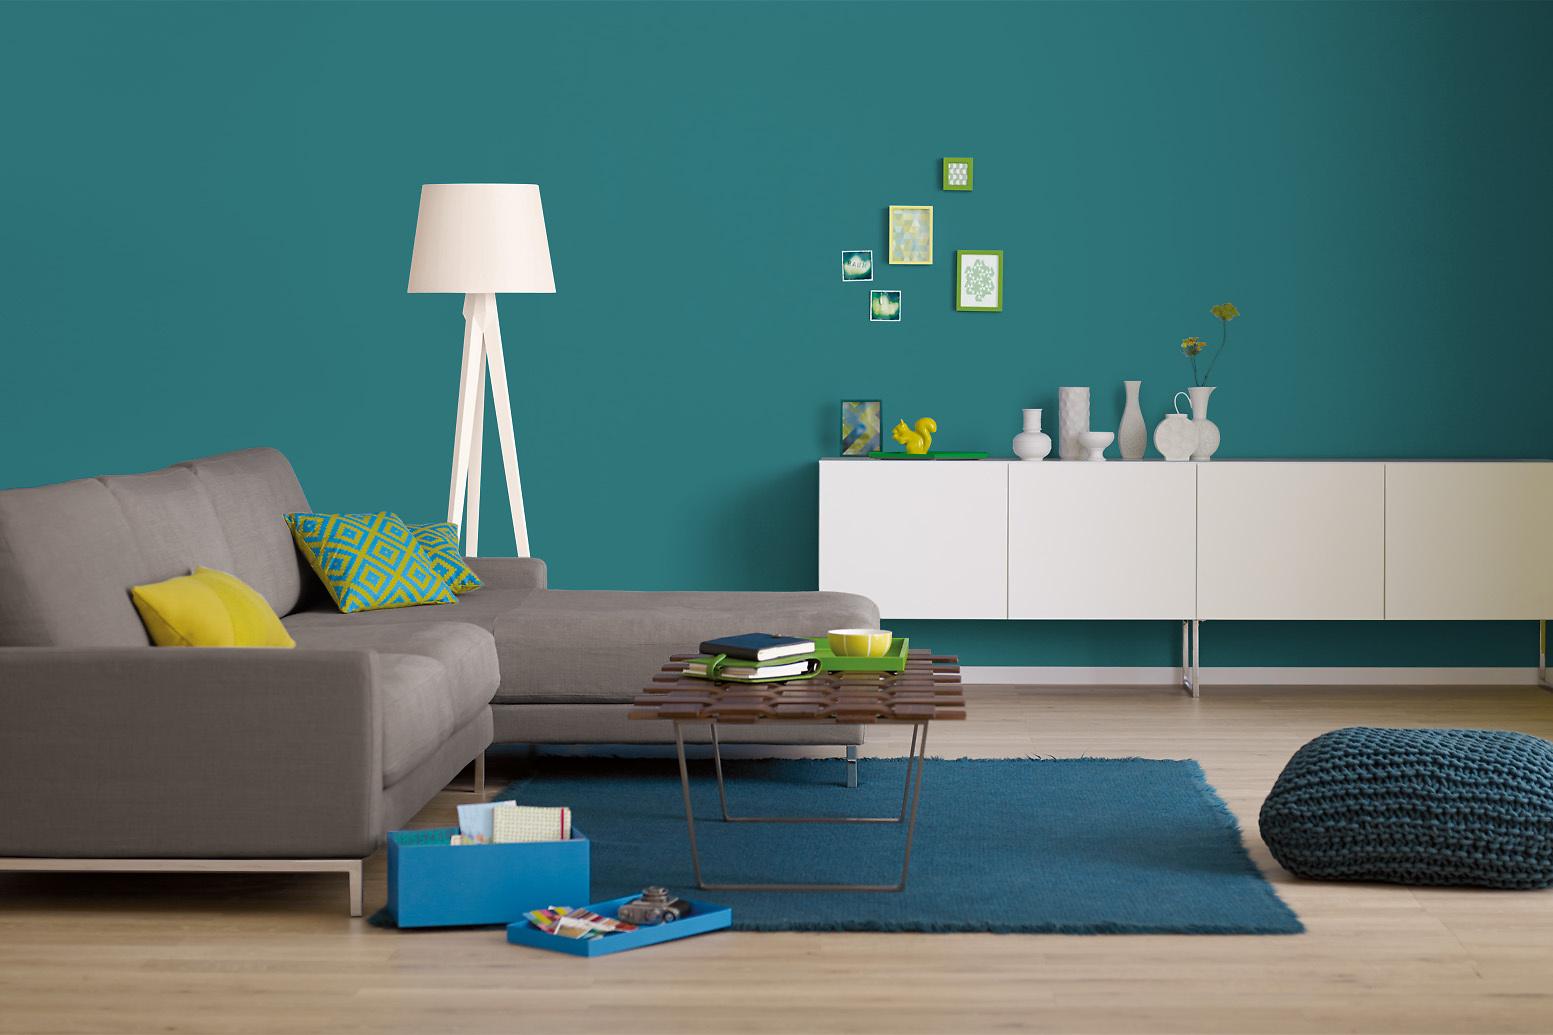 Innenfarbe In Grun Blau Turkis Streichen Alpina Farbrezepte Petrol Deluxe Alpina Farben